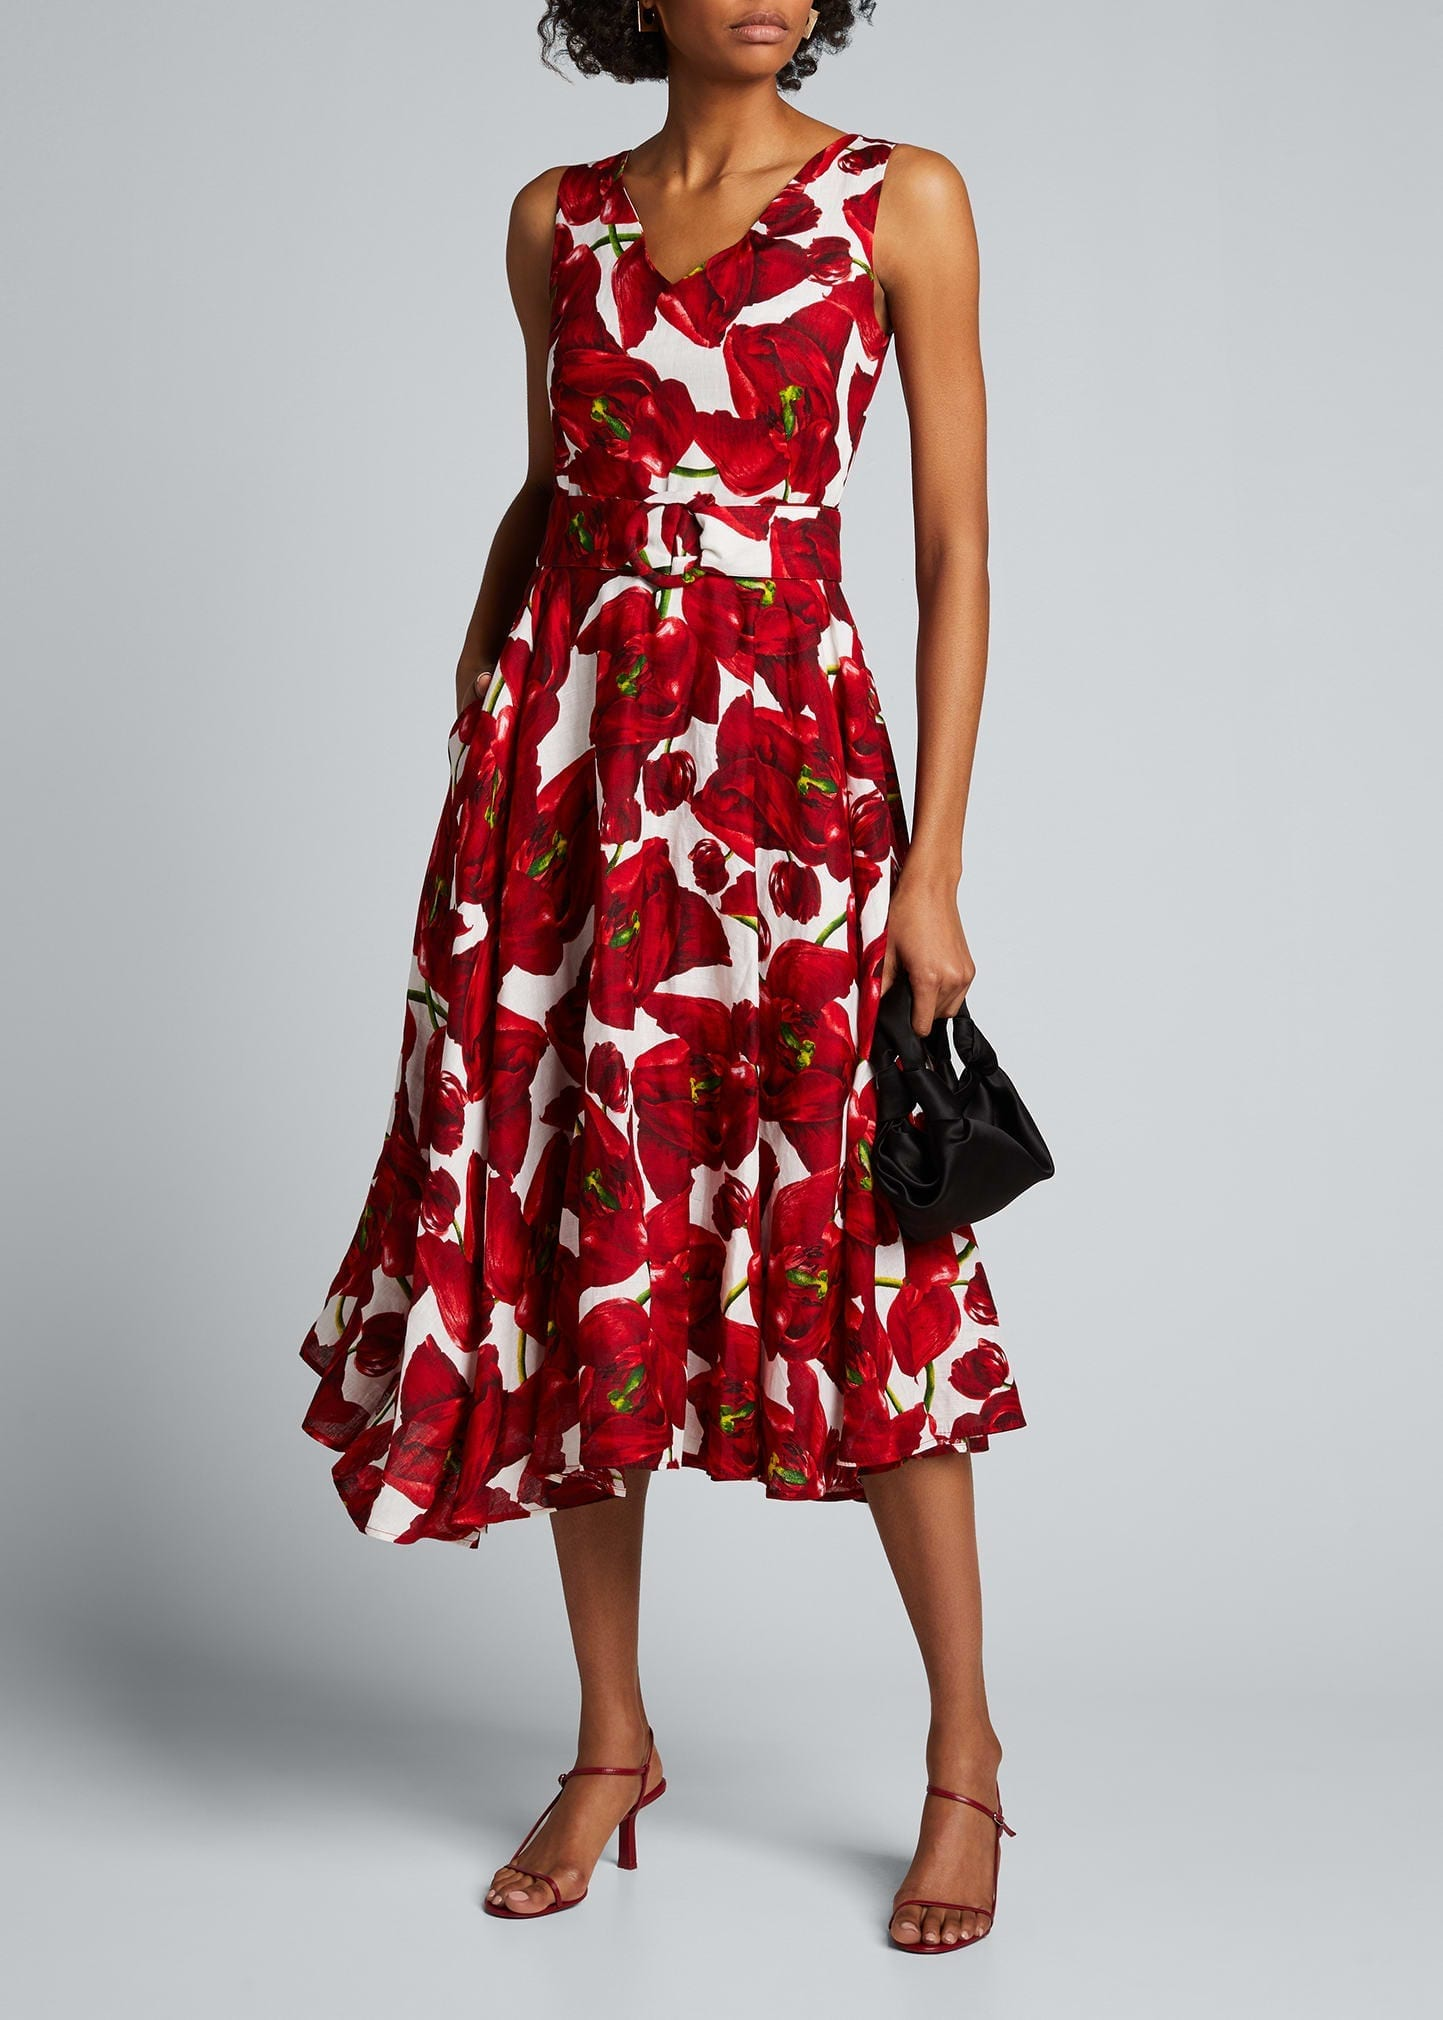 SAMANTHA SUNG Floral-Print Linen A-Line Midi Dress